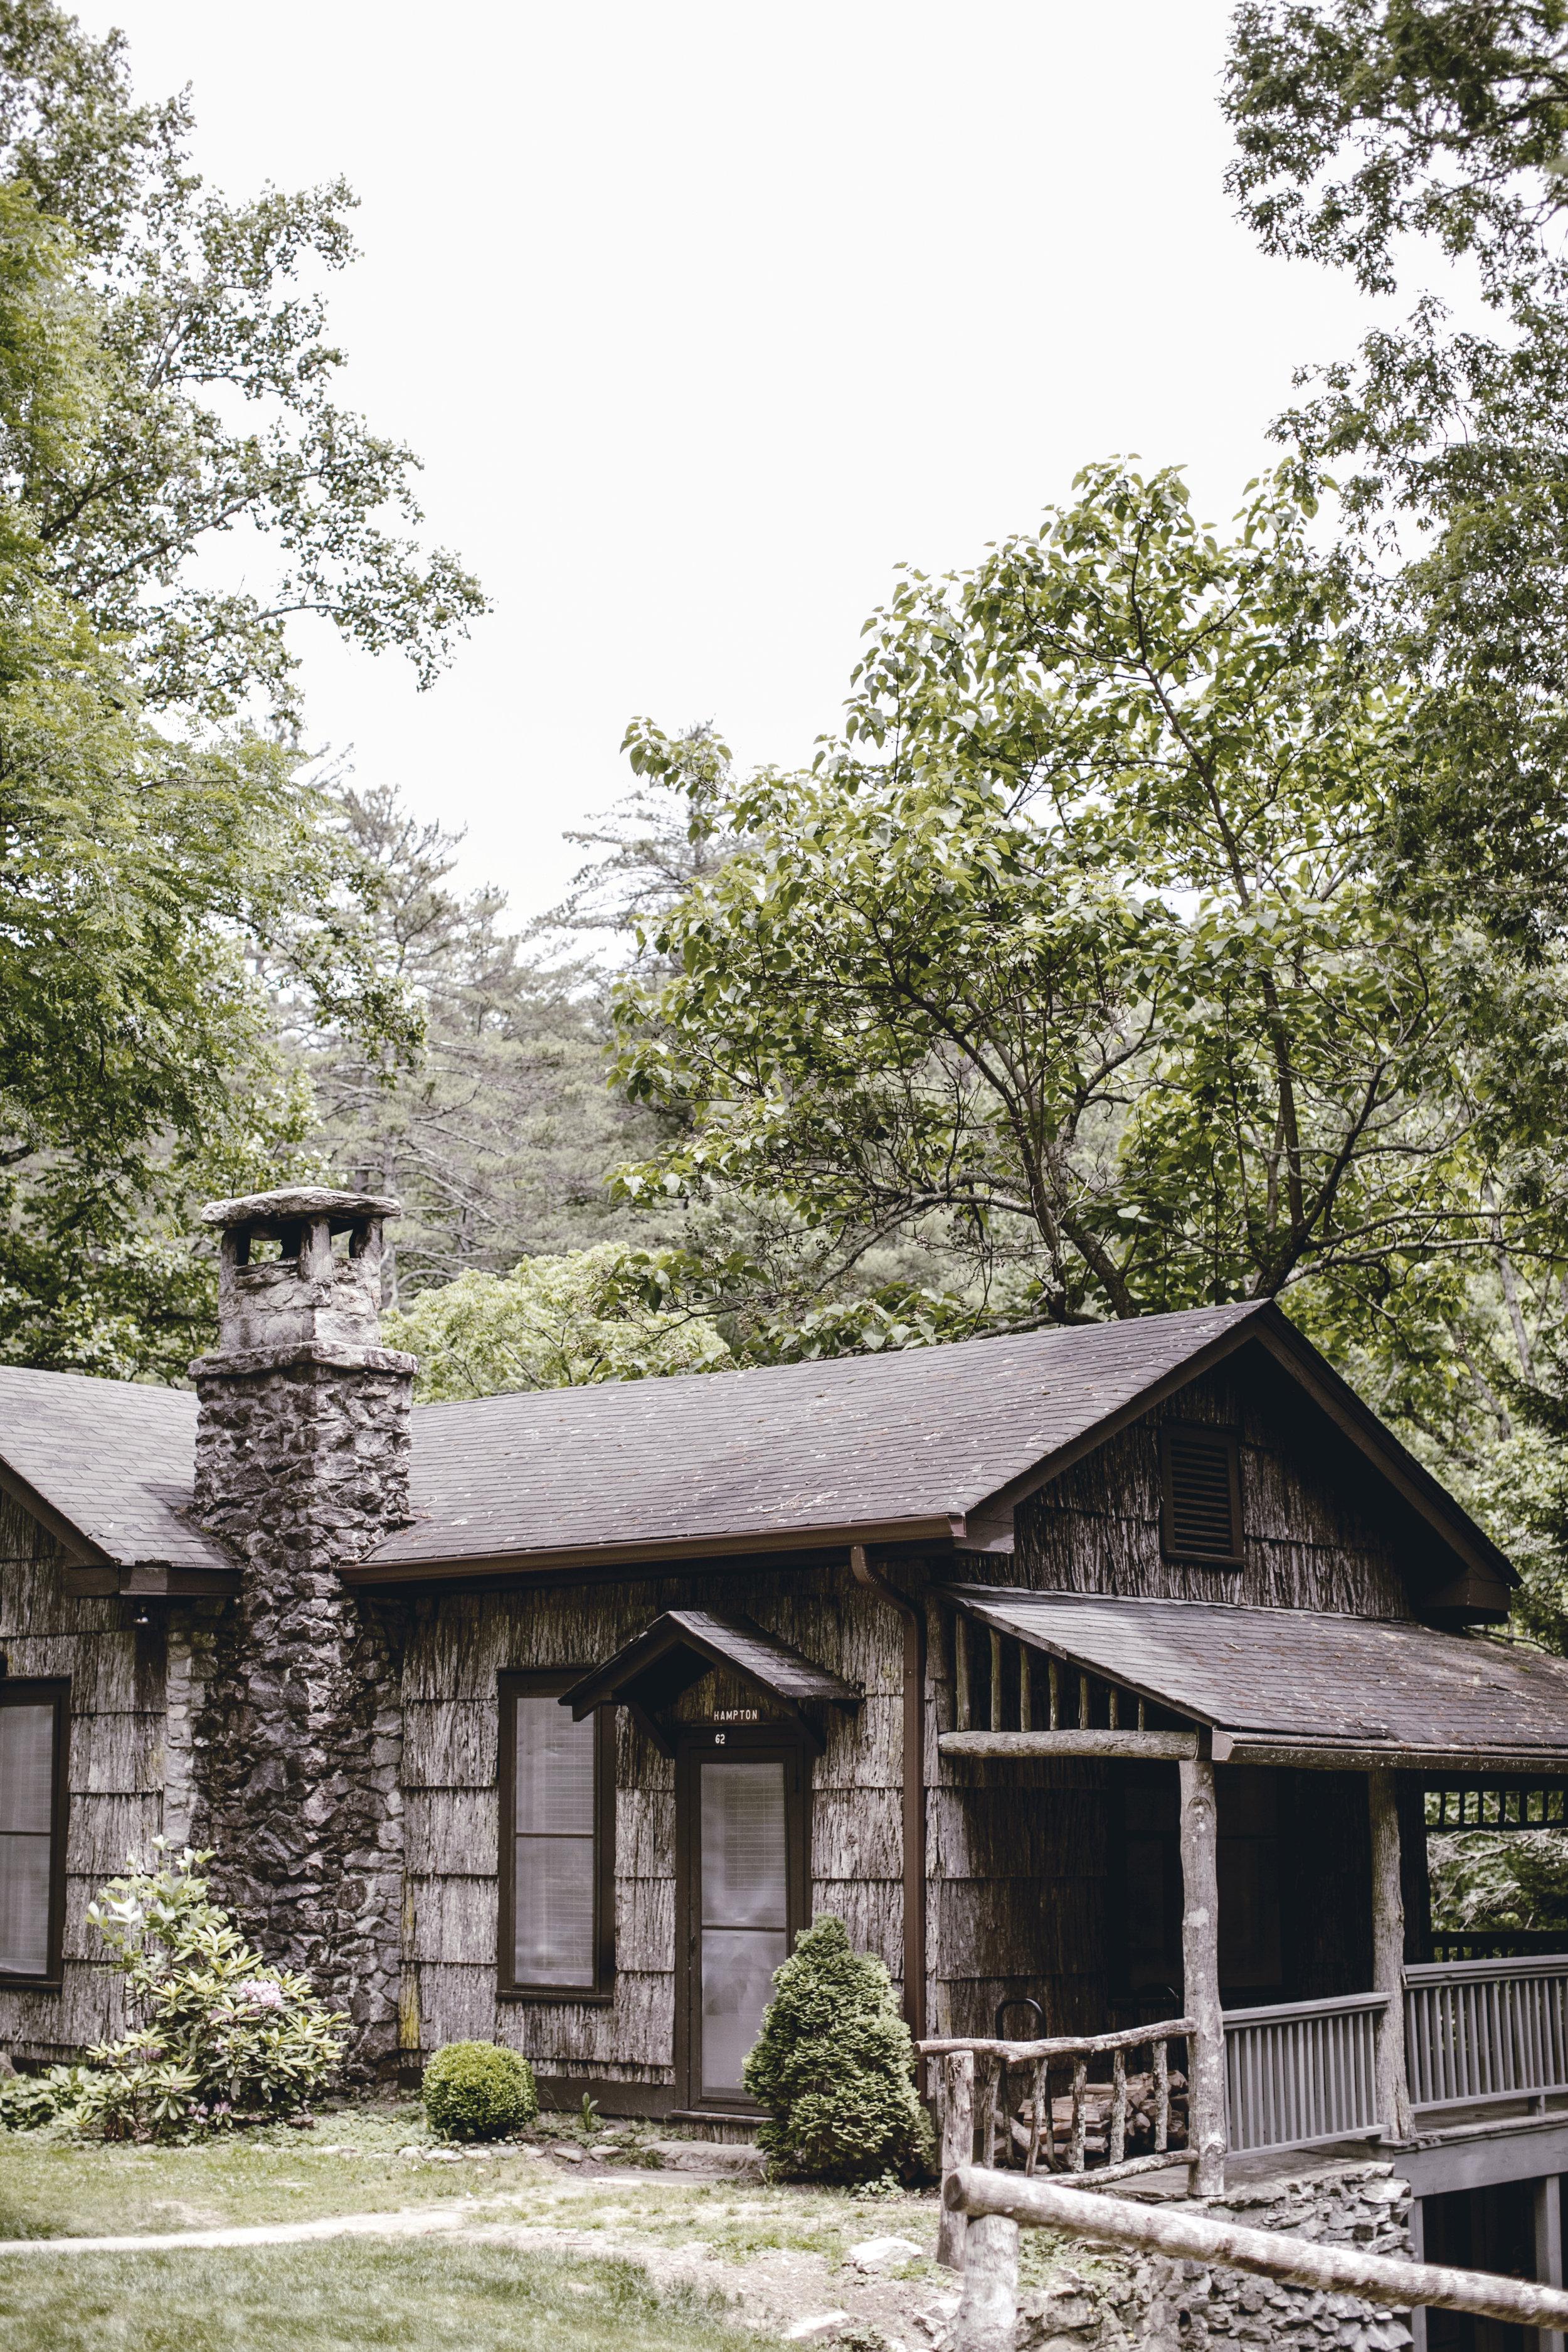 mountain cabin in cashiers North Carolina / heirloomed